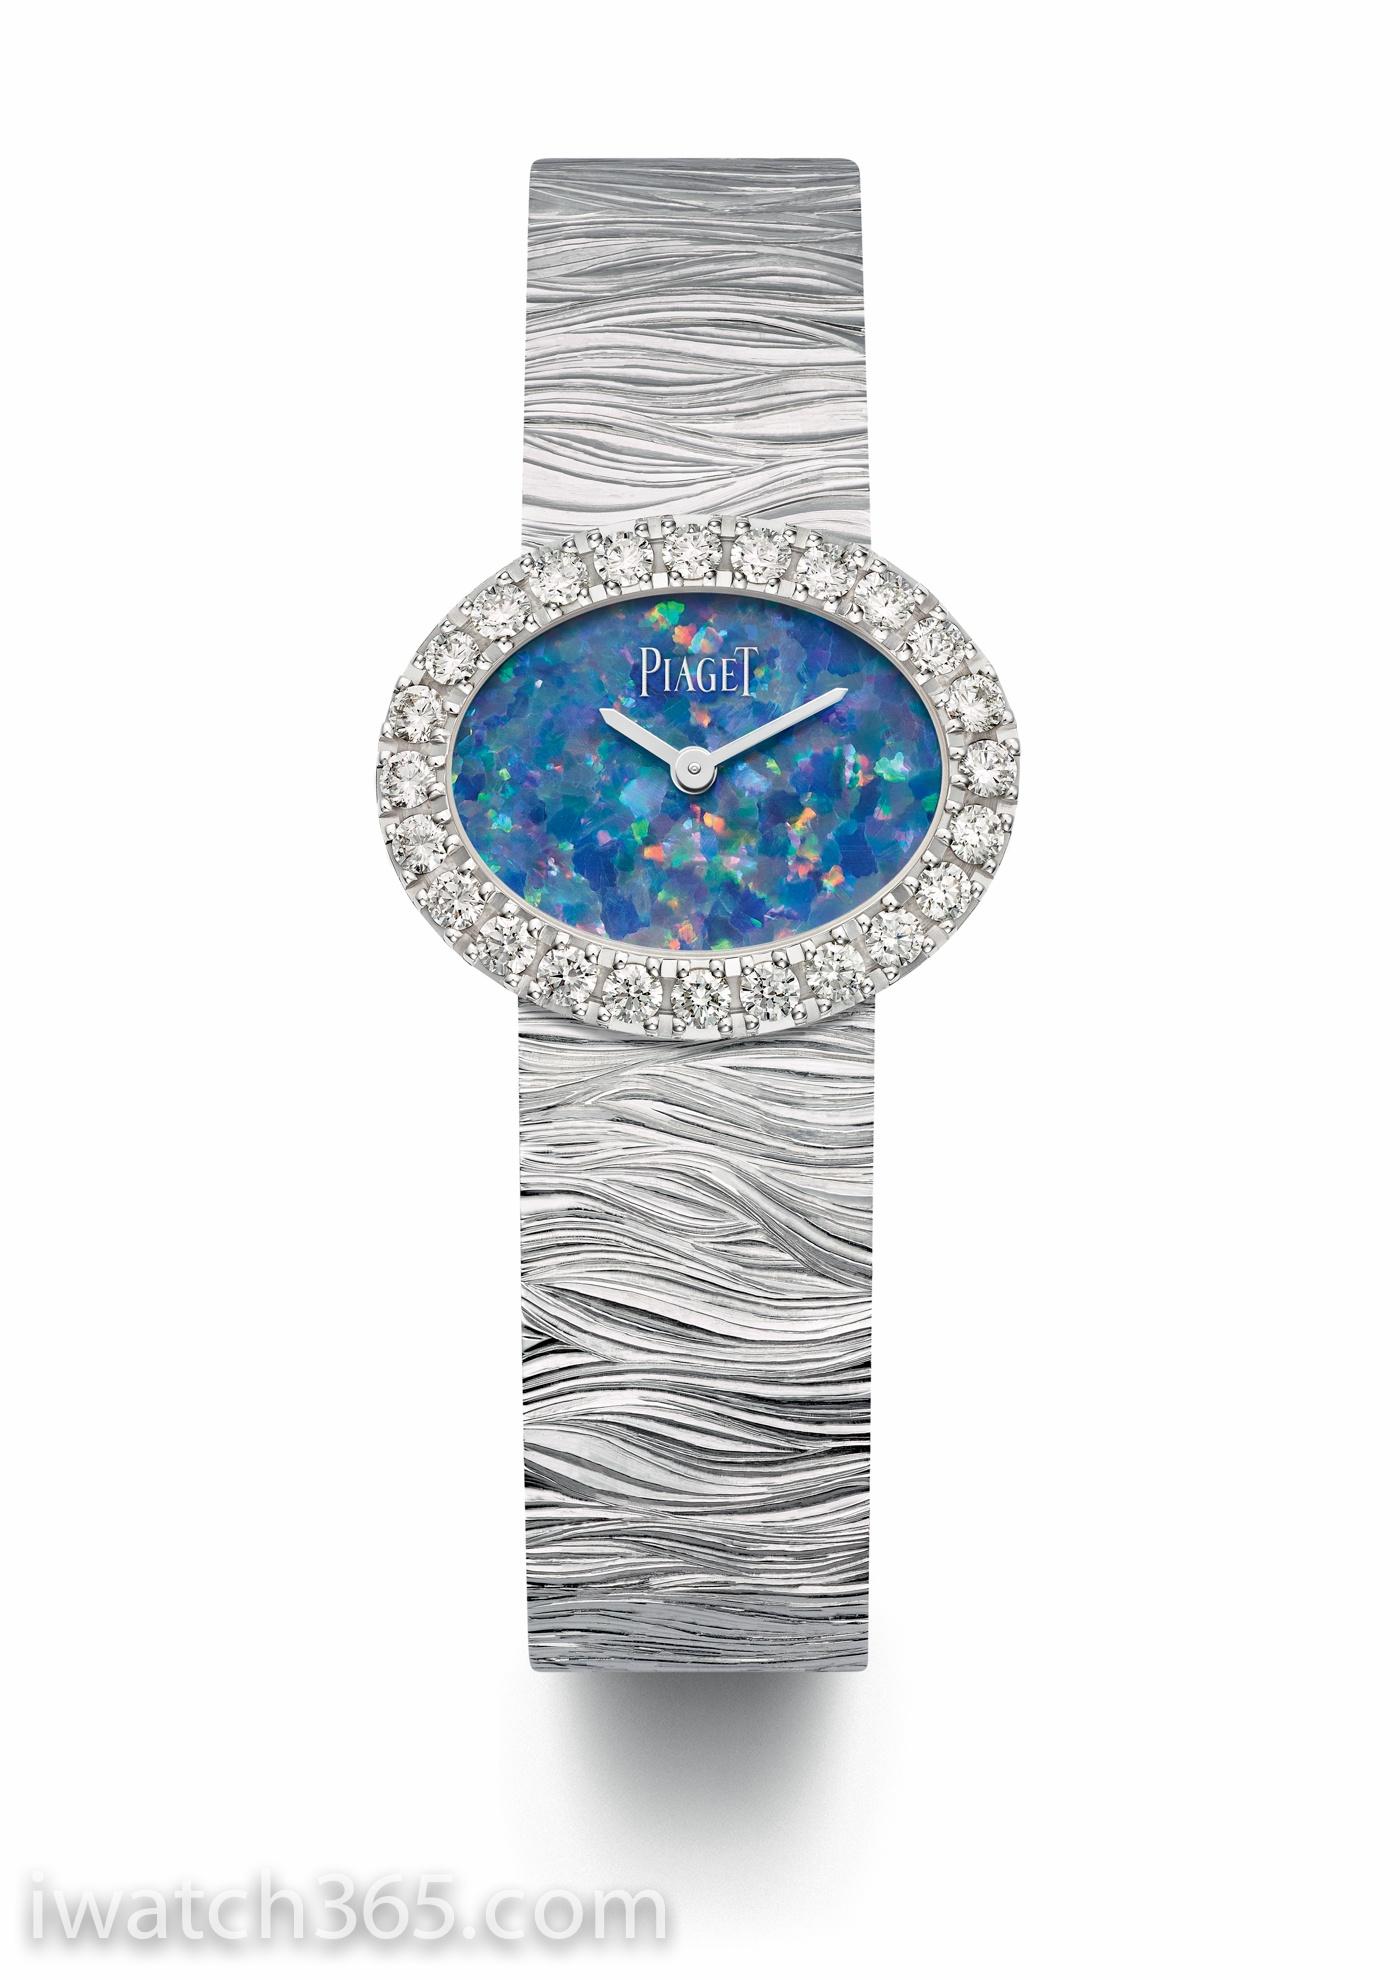 【SIHH2018】伯爵Extremely Lady系列腕表推出华丽无比的新款表带设计